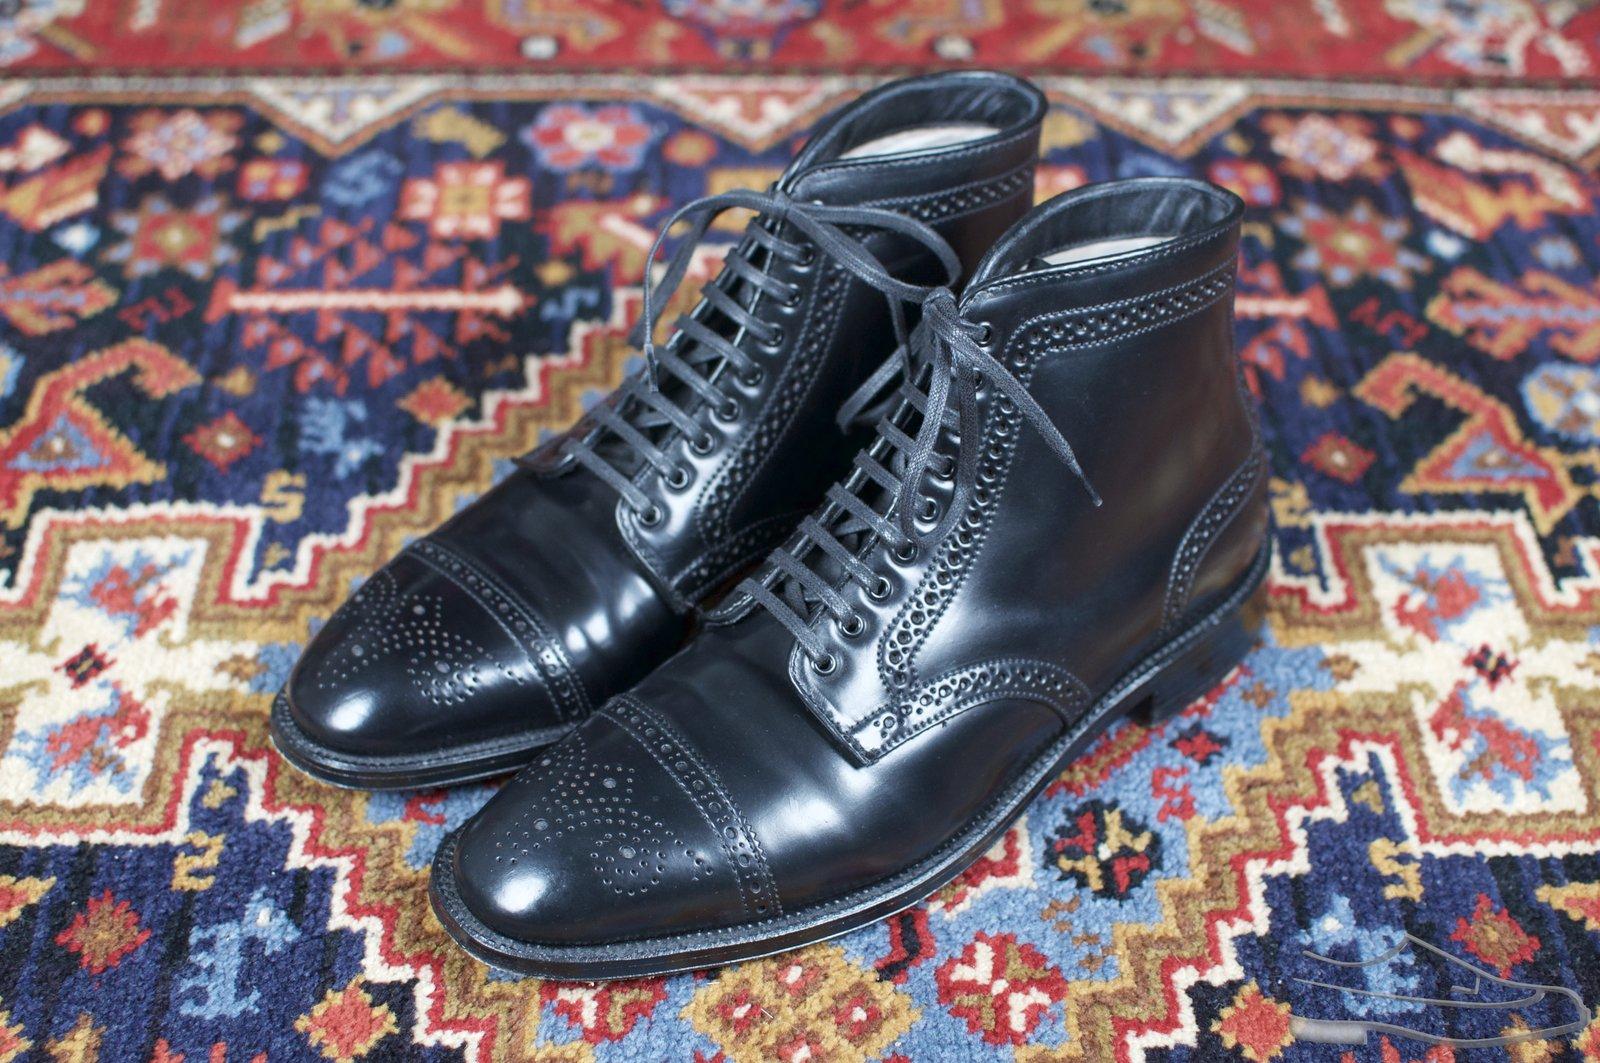 Alden Black Shell Cordovan MCT Boot - 2021-04-13 - 1.jpg